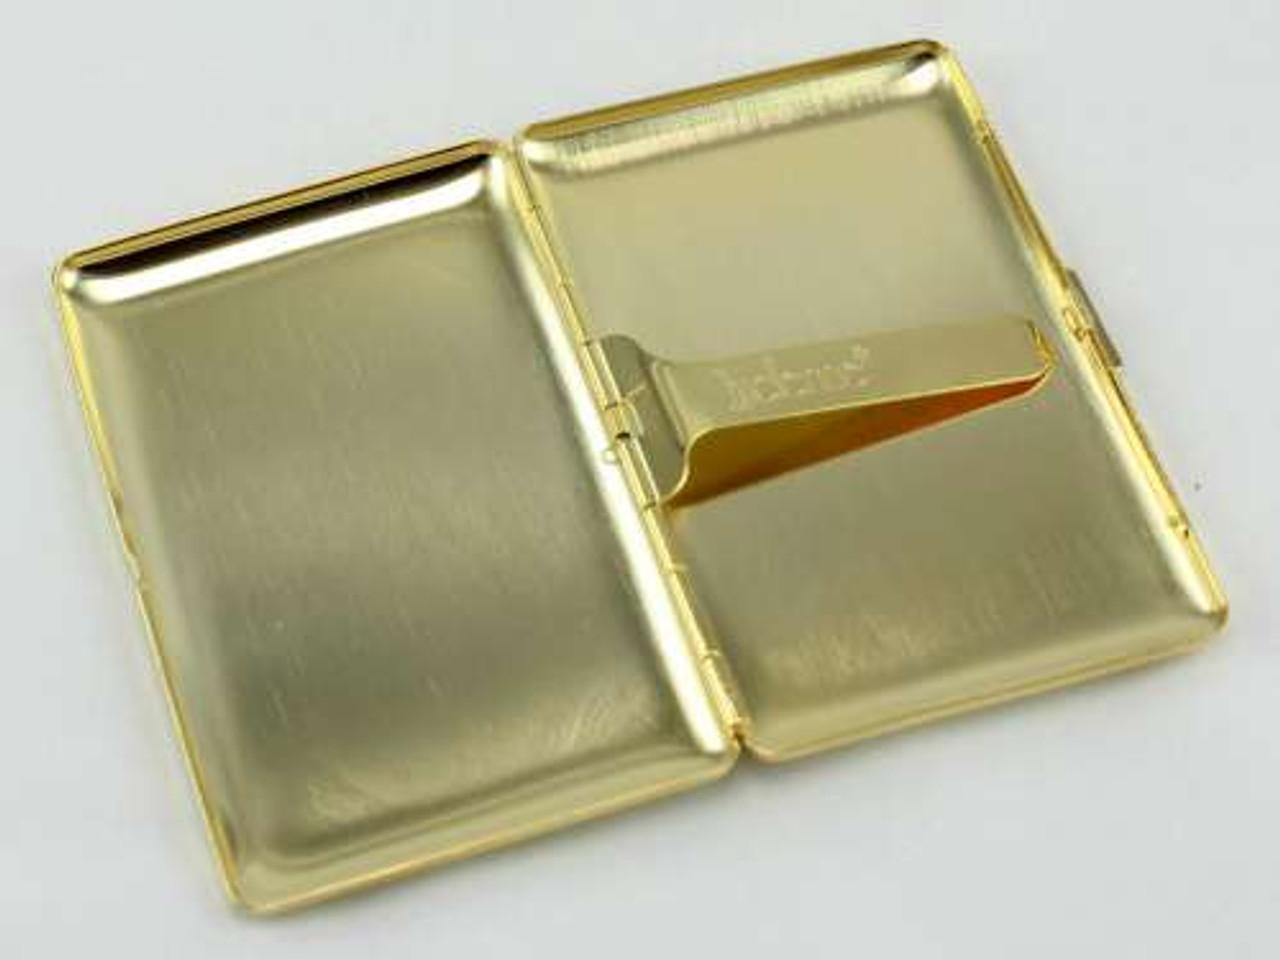 Lucienne Gold Etched Cigarette Case